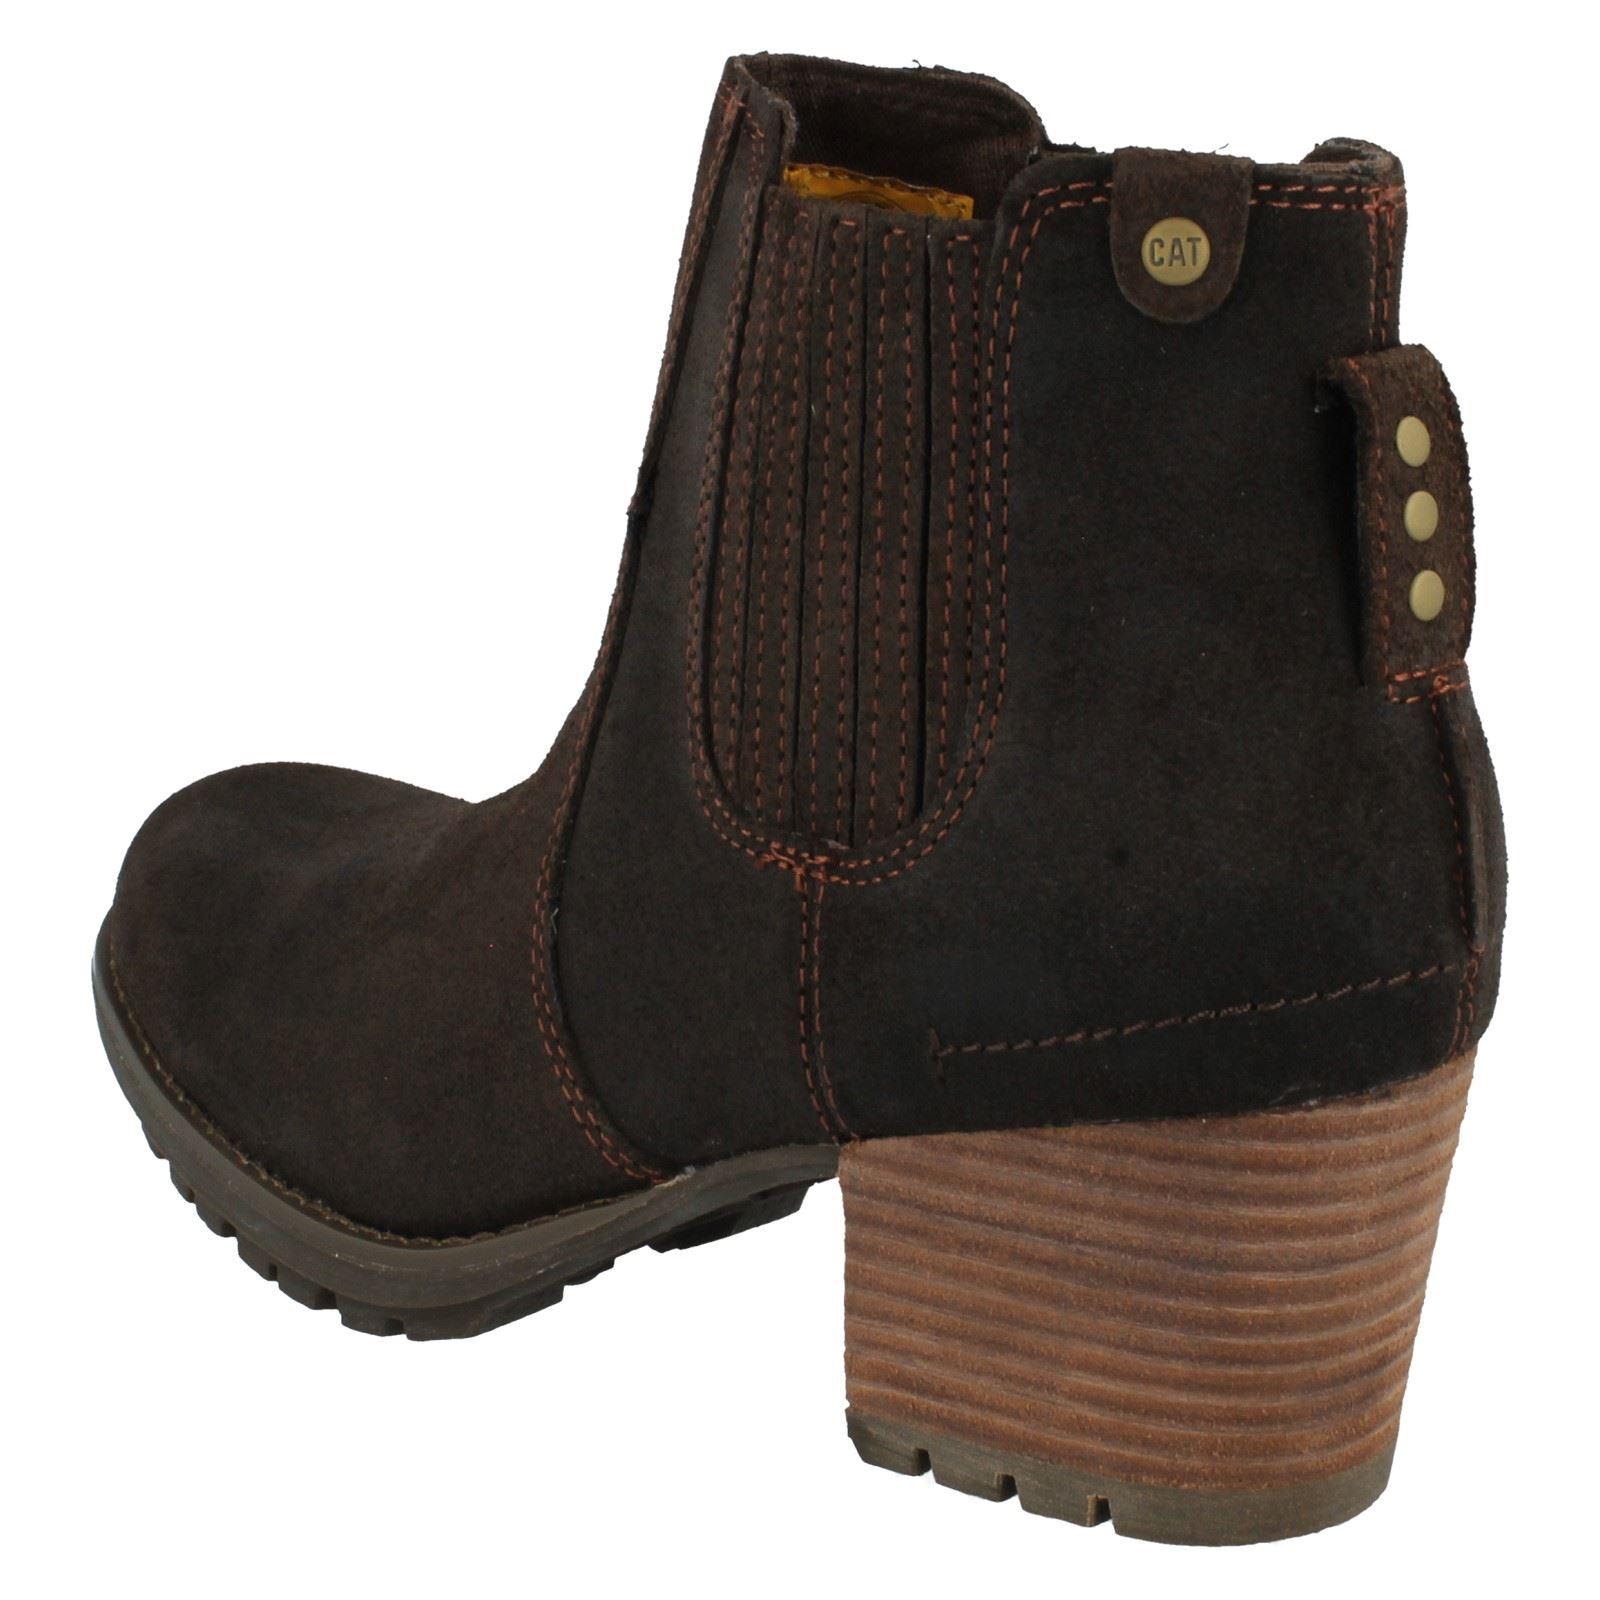 Luxury Clothes Shoes Amp Accessories Gt Women39s Shoes Gt Boots